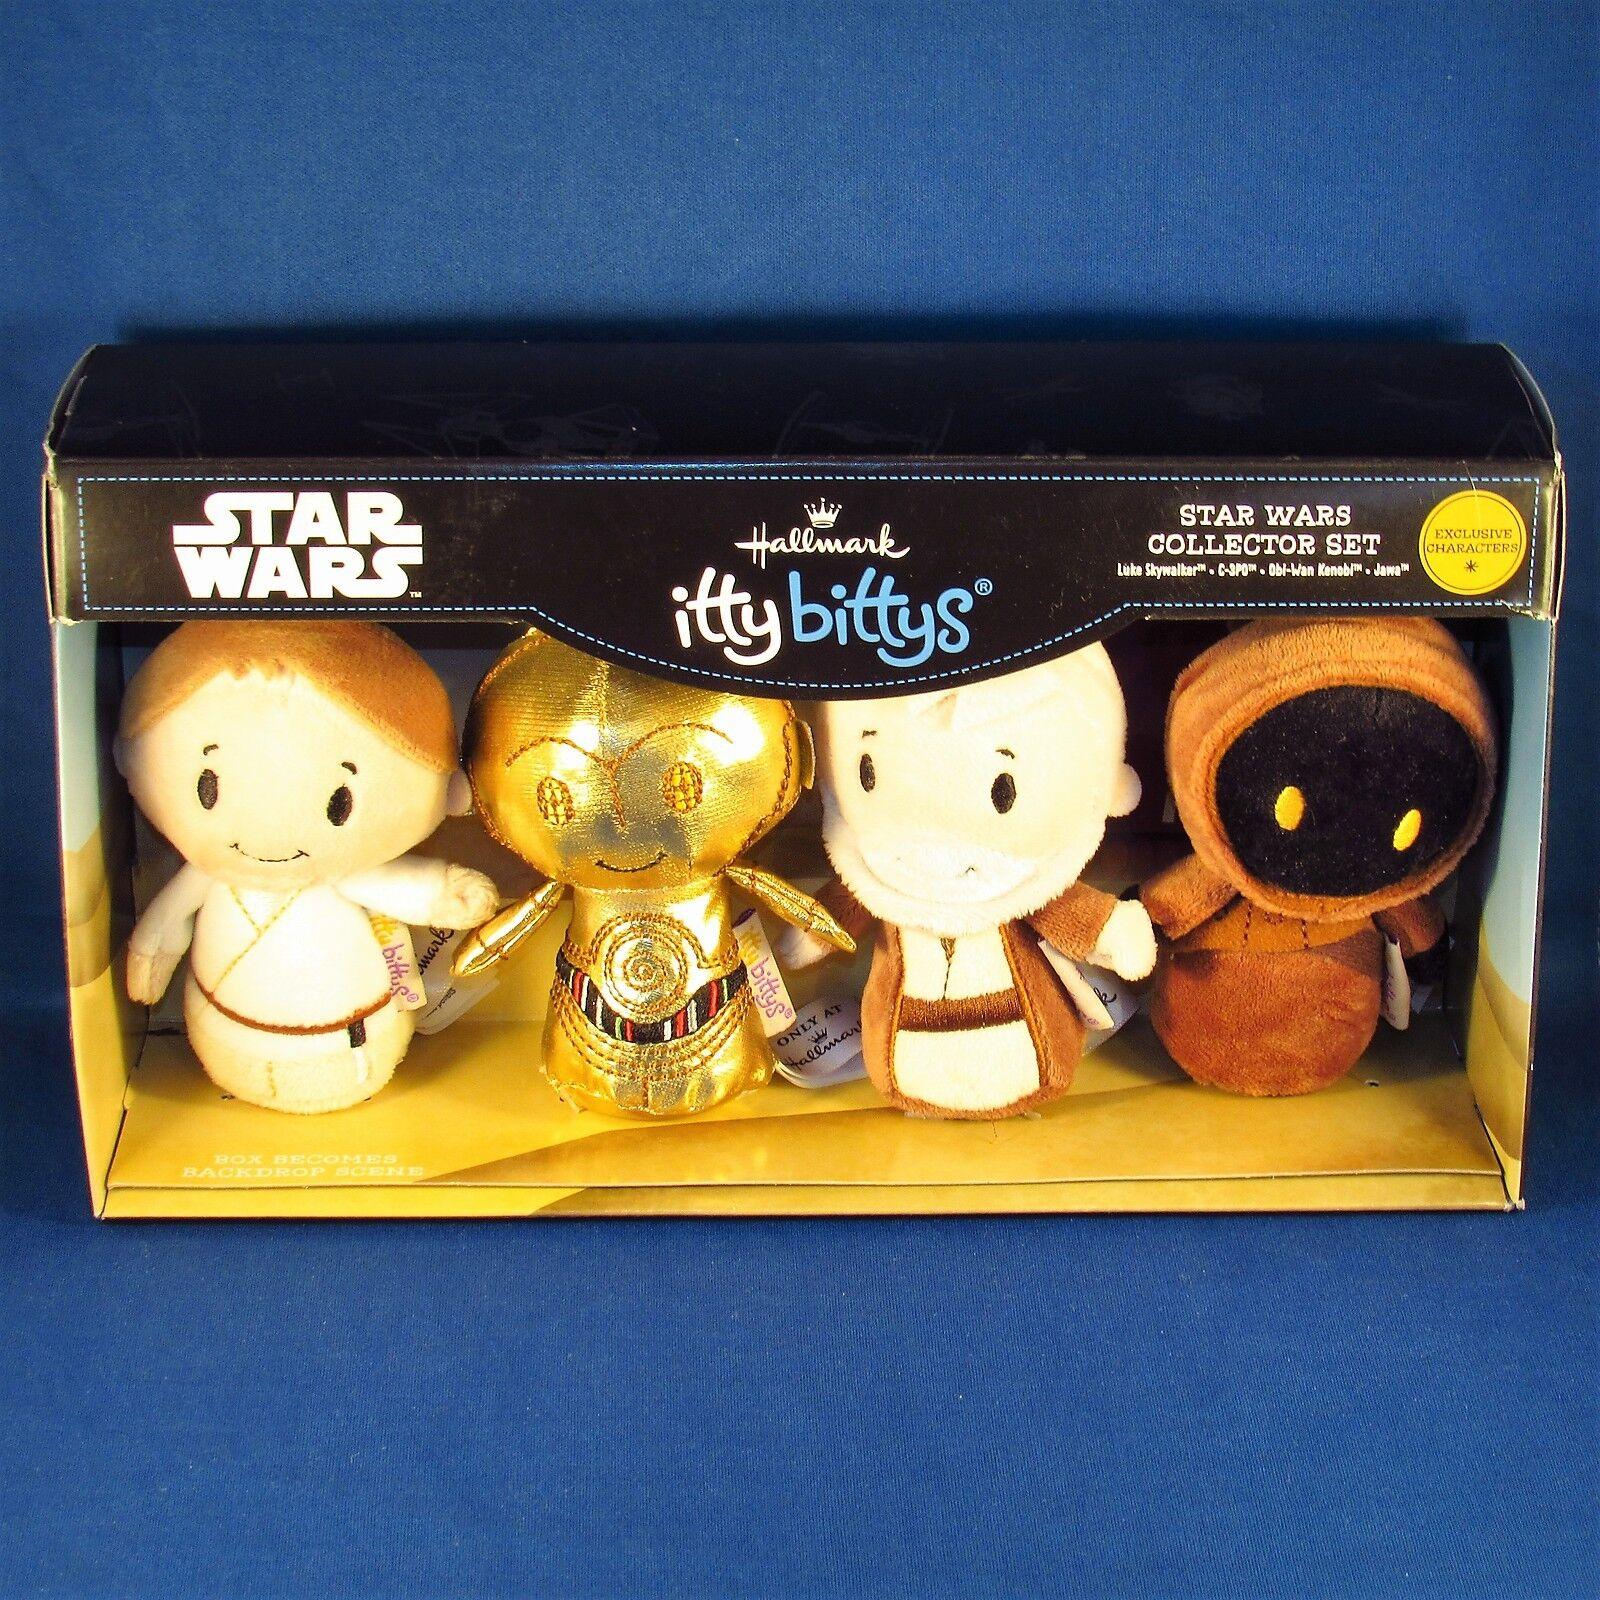 Hallmark - Itty Bittys - stjärnornas krig - Luke Sykpromänader, C -3PO, Obi -Wan Kenobi, Jawa